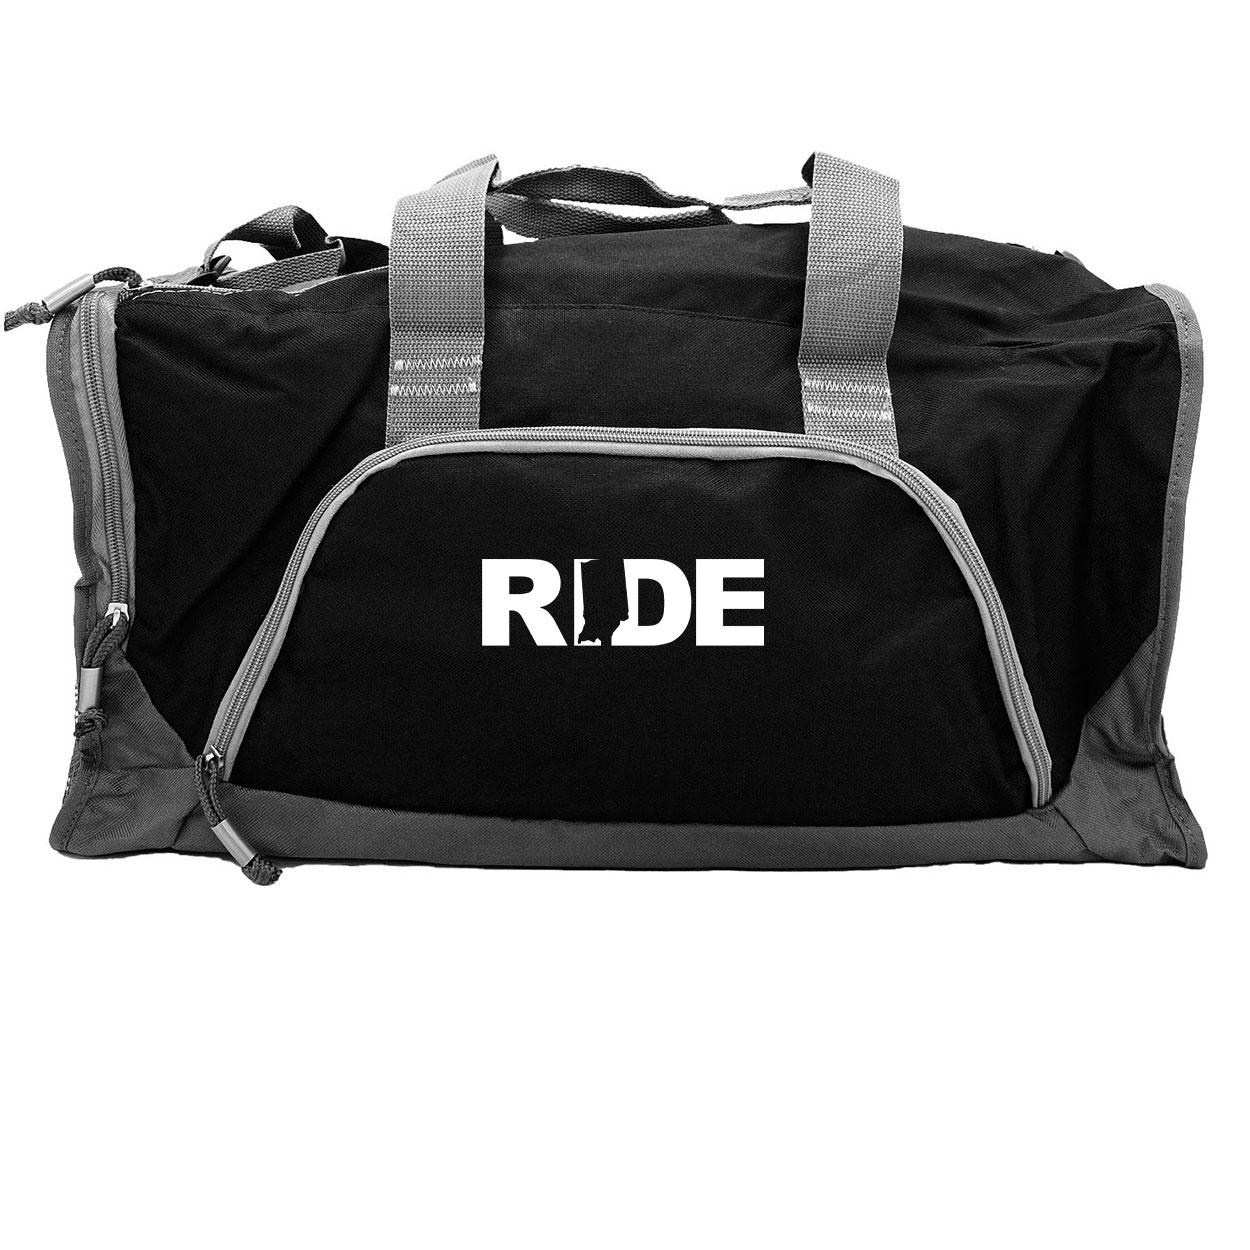 Ride Indiana Classic Rangeley Sport Duffel Bag Black (White Logo)